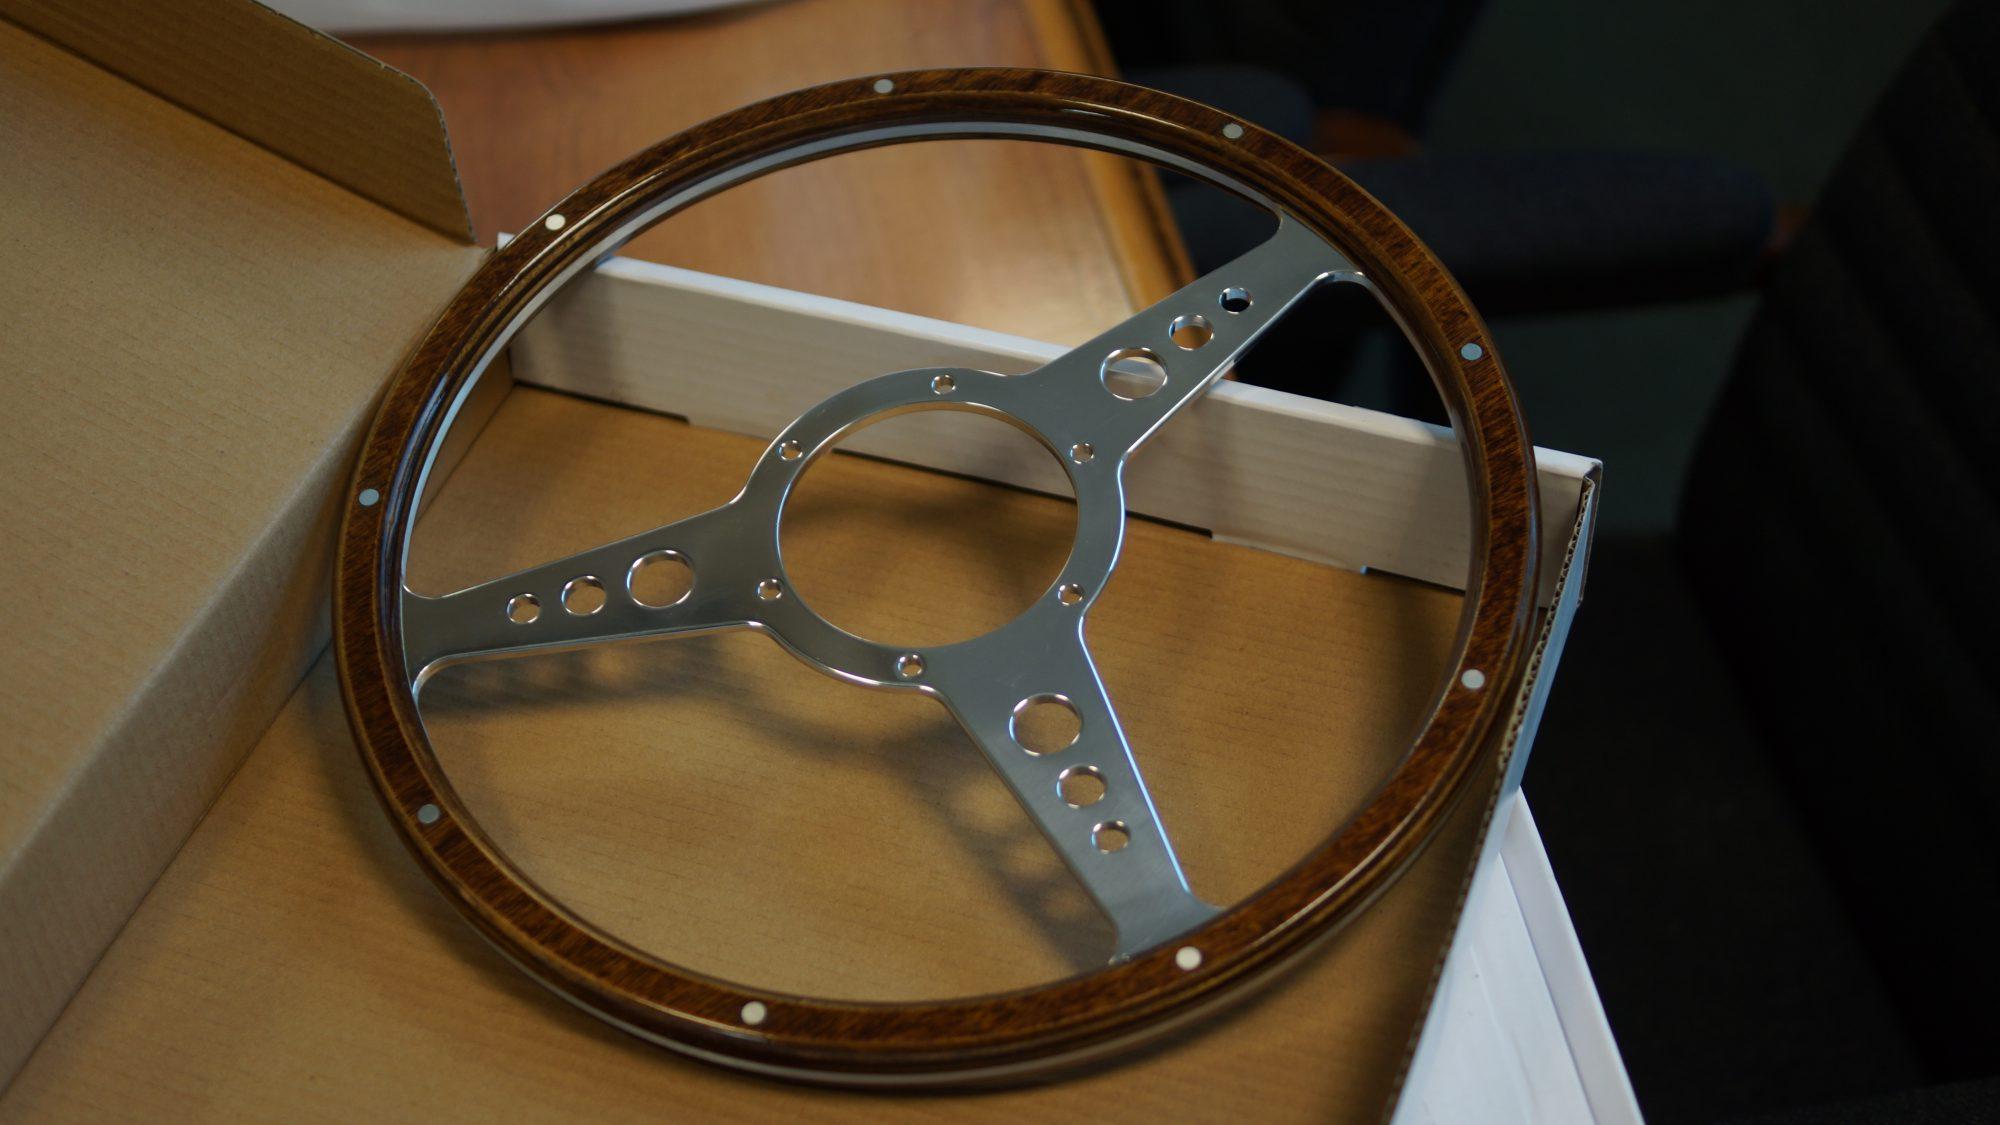 Mountney, Mountney Classic, steering wheel, wooden steering wheel, eather steering wheel, classic car, retro car, motoring, automotive, classic, retro, carandclassic, carandclassic.co.uk